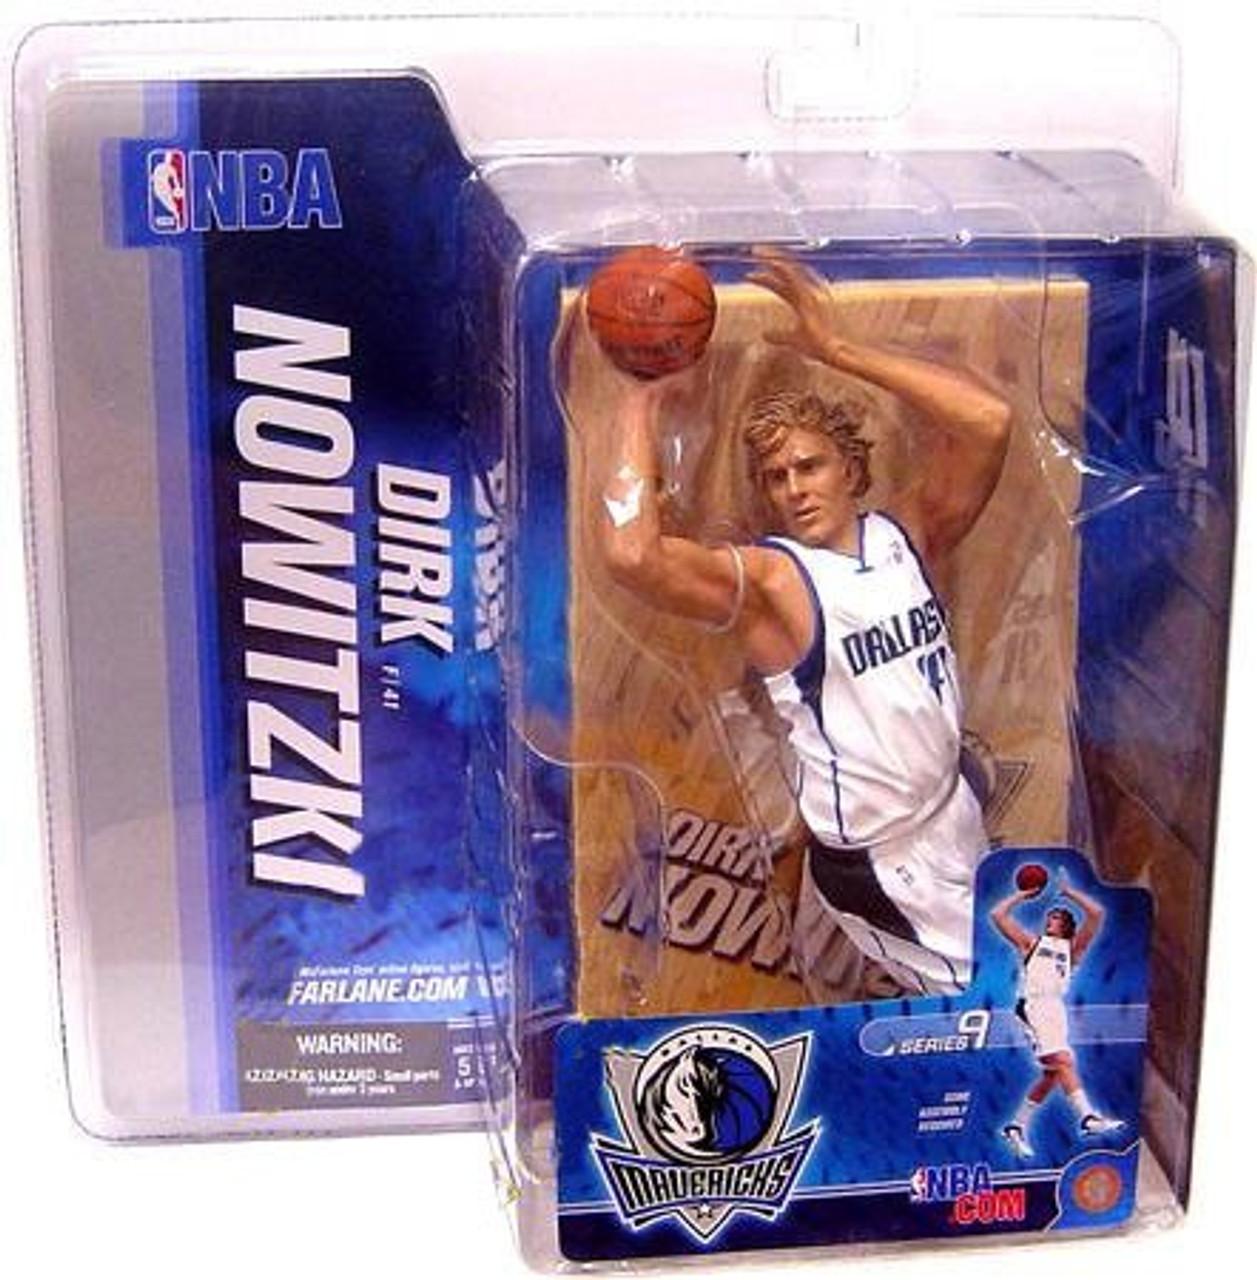 McFarlane Toys NBA Dallas Mavericks Sports Picks Series 9 Dirk Nowitzki Action Figure [White Jersey]